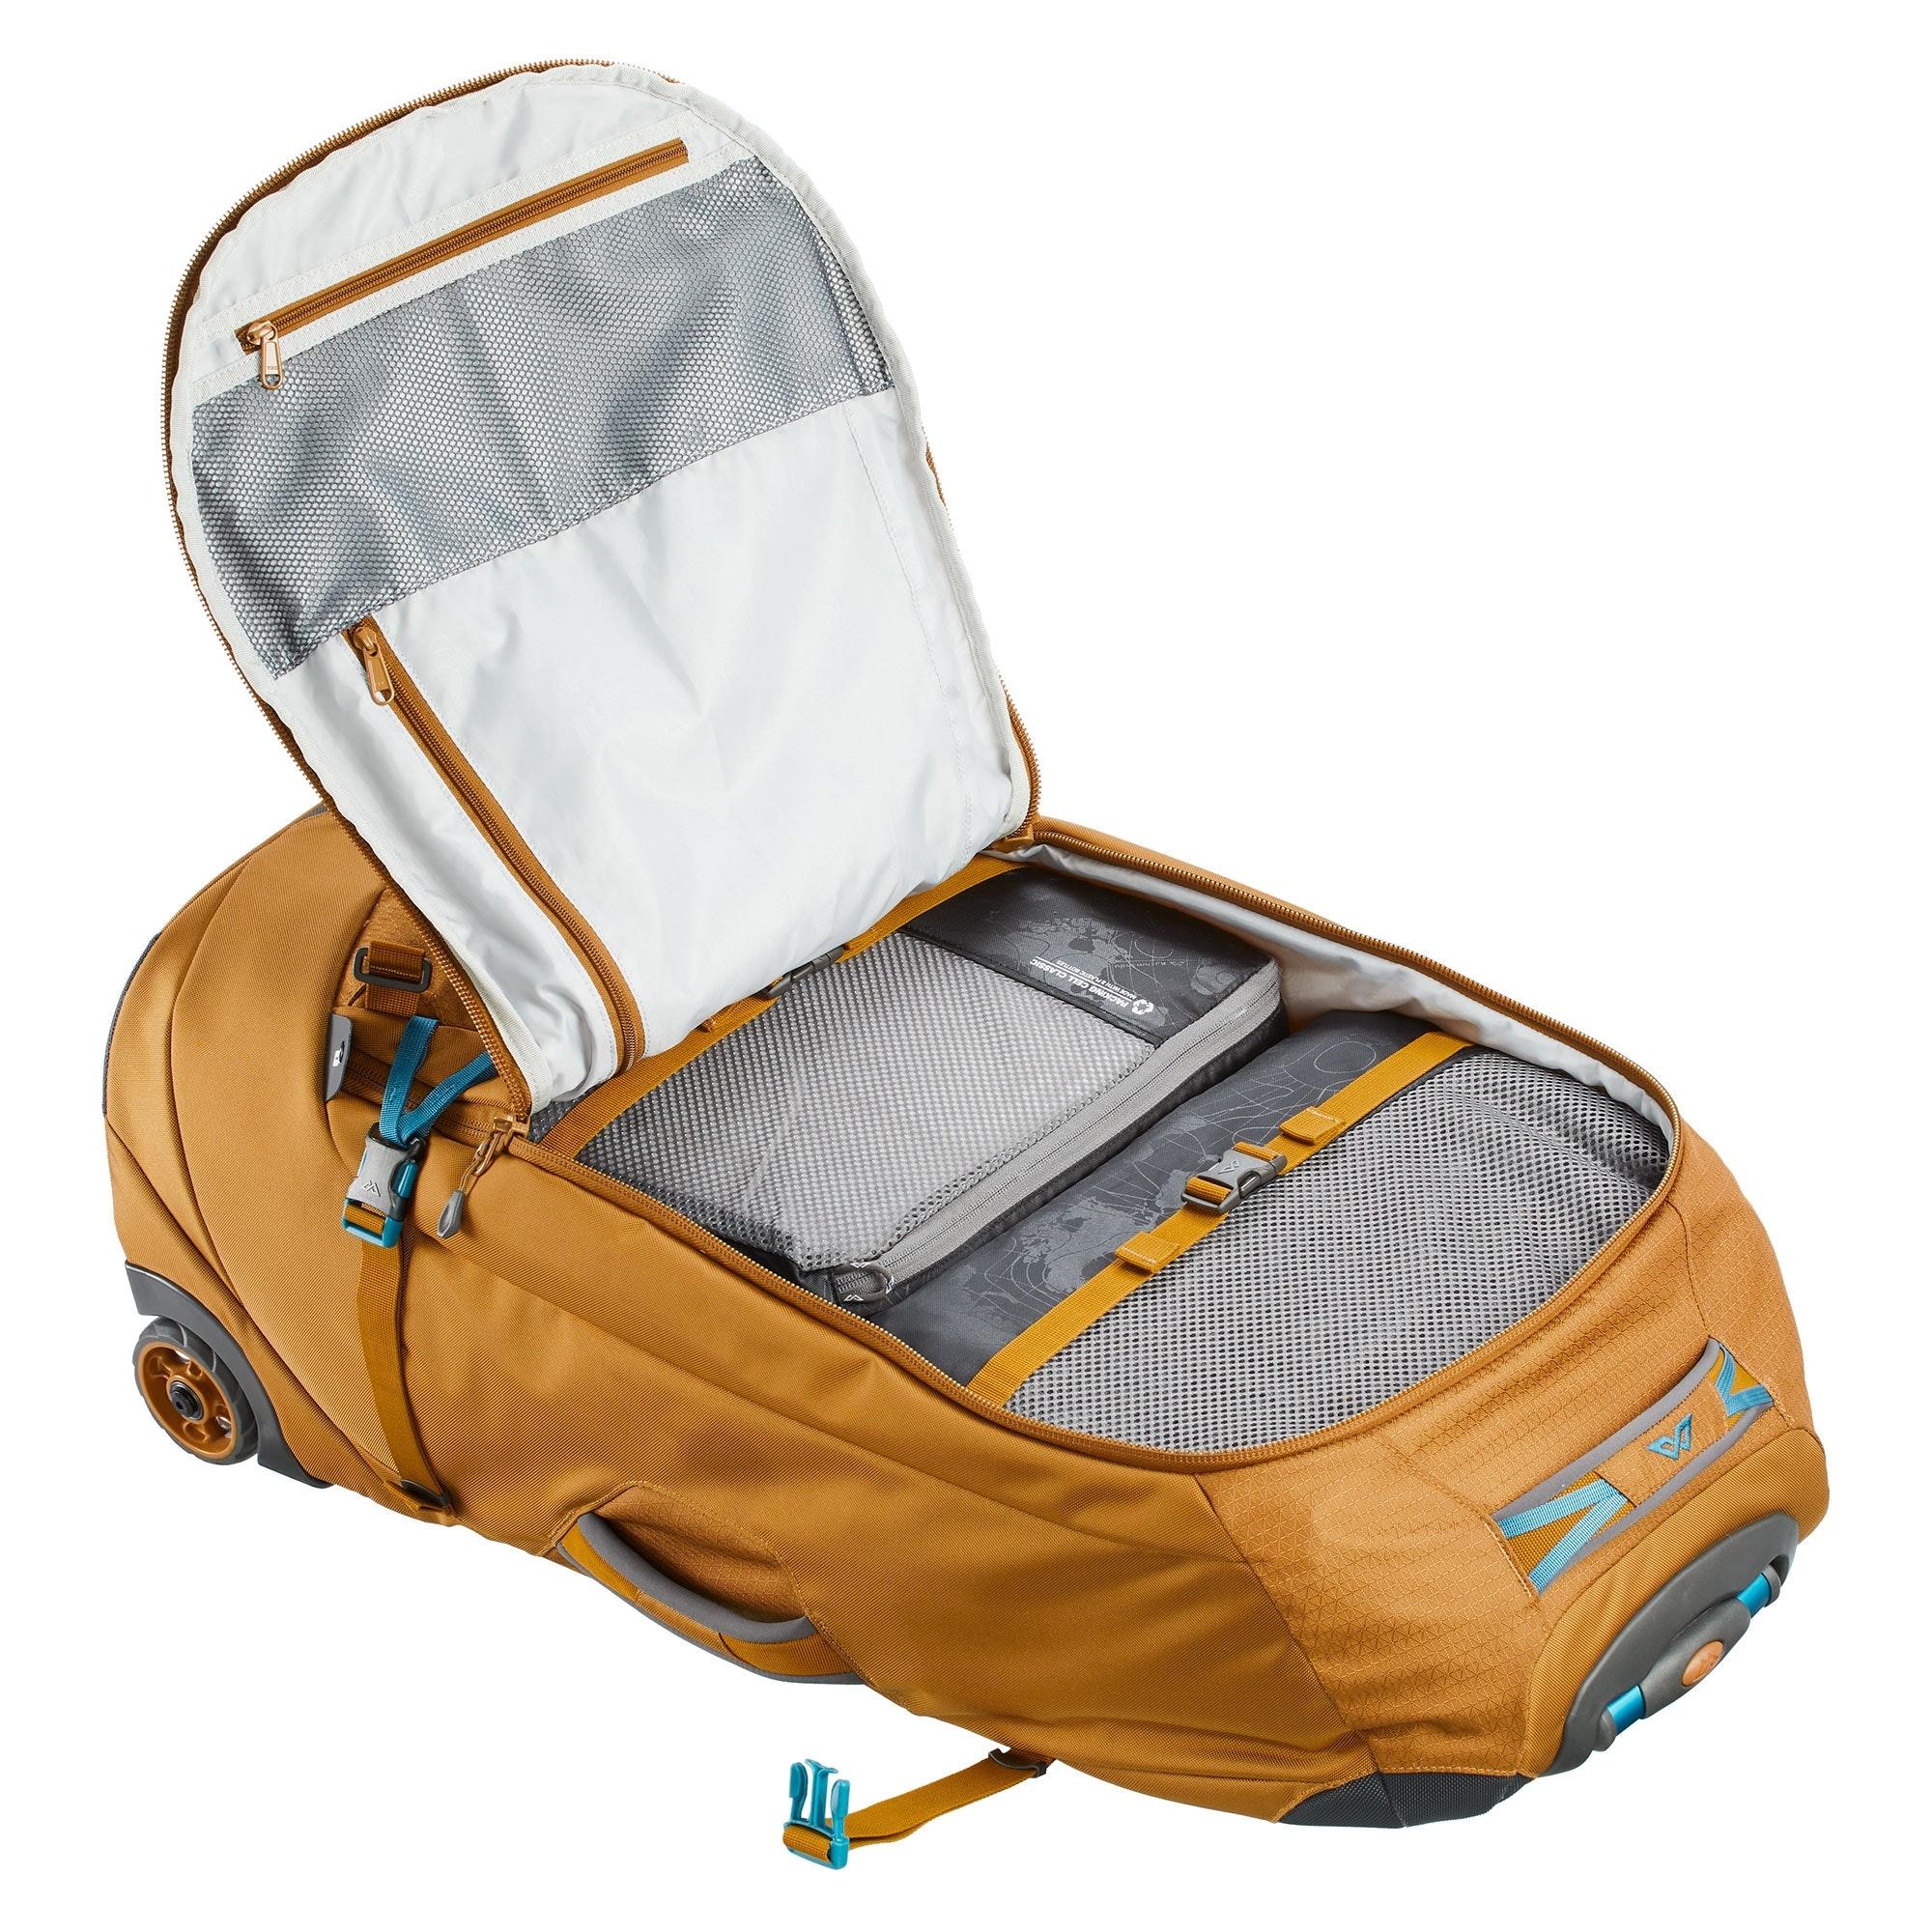 thumbnail 20 - NEW-Kathmandu-Hybrid-70L-Backpack-Wheeled-Handle-Luggage-Bag-Travel-Trolley